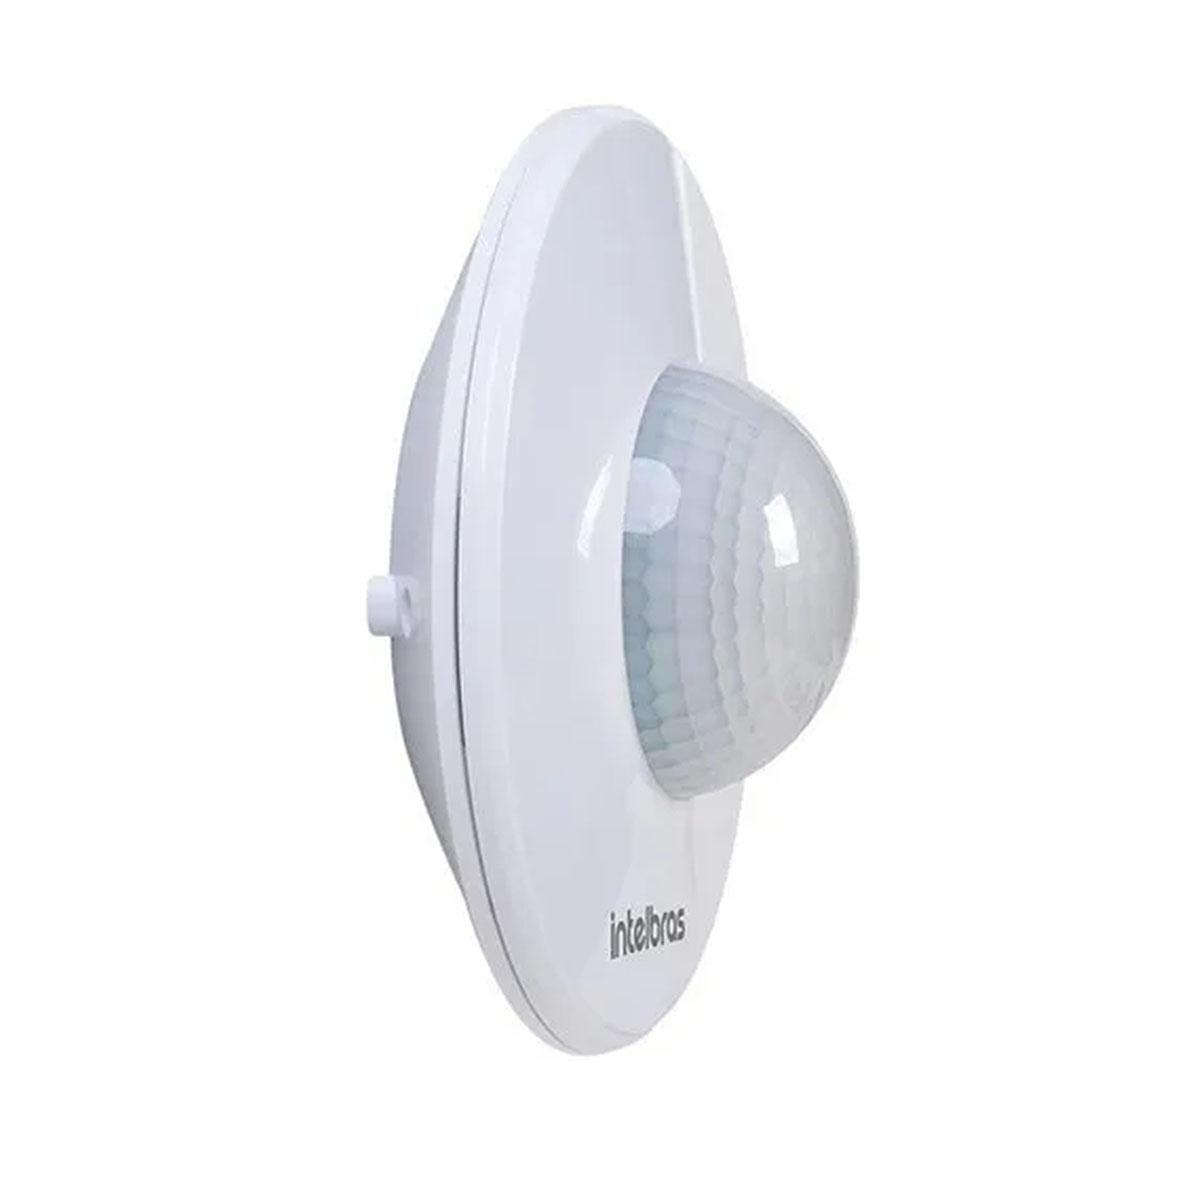 Kit 05 Sensor De Presença Intelbras Para Iluminação Esp 360+